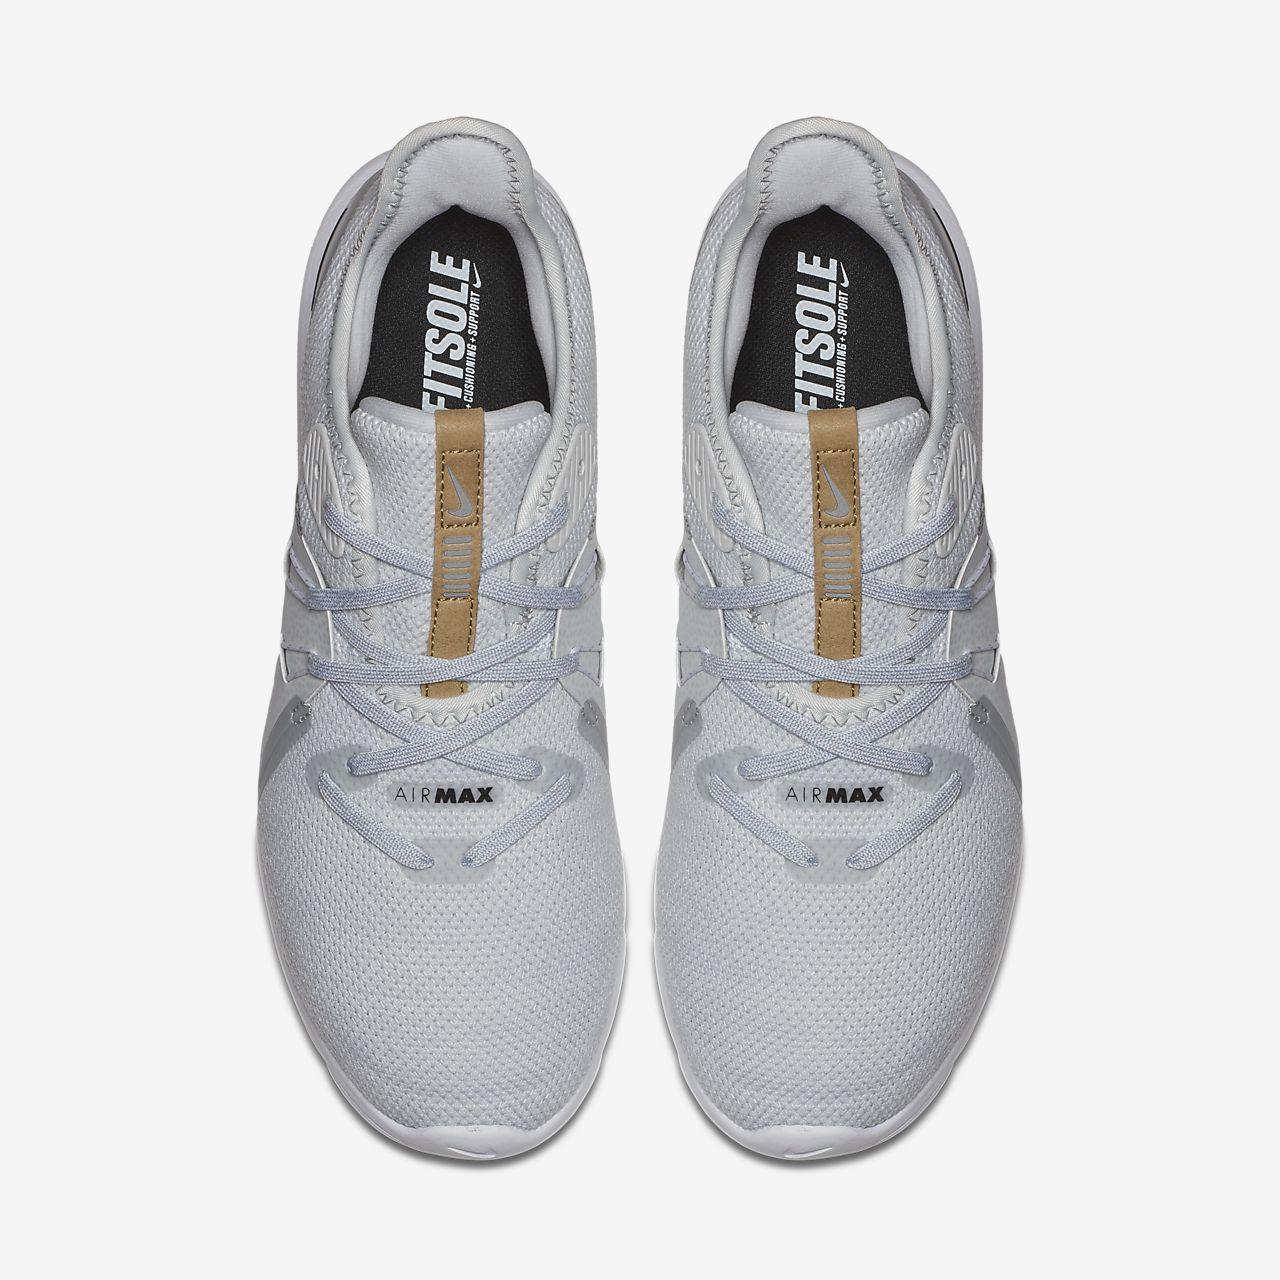 34f936bb0c5 Calzado para mujer Nike Air Max Sequent 3. Nike.com CL